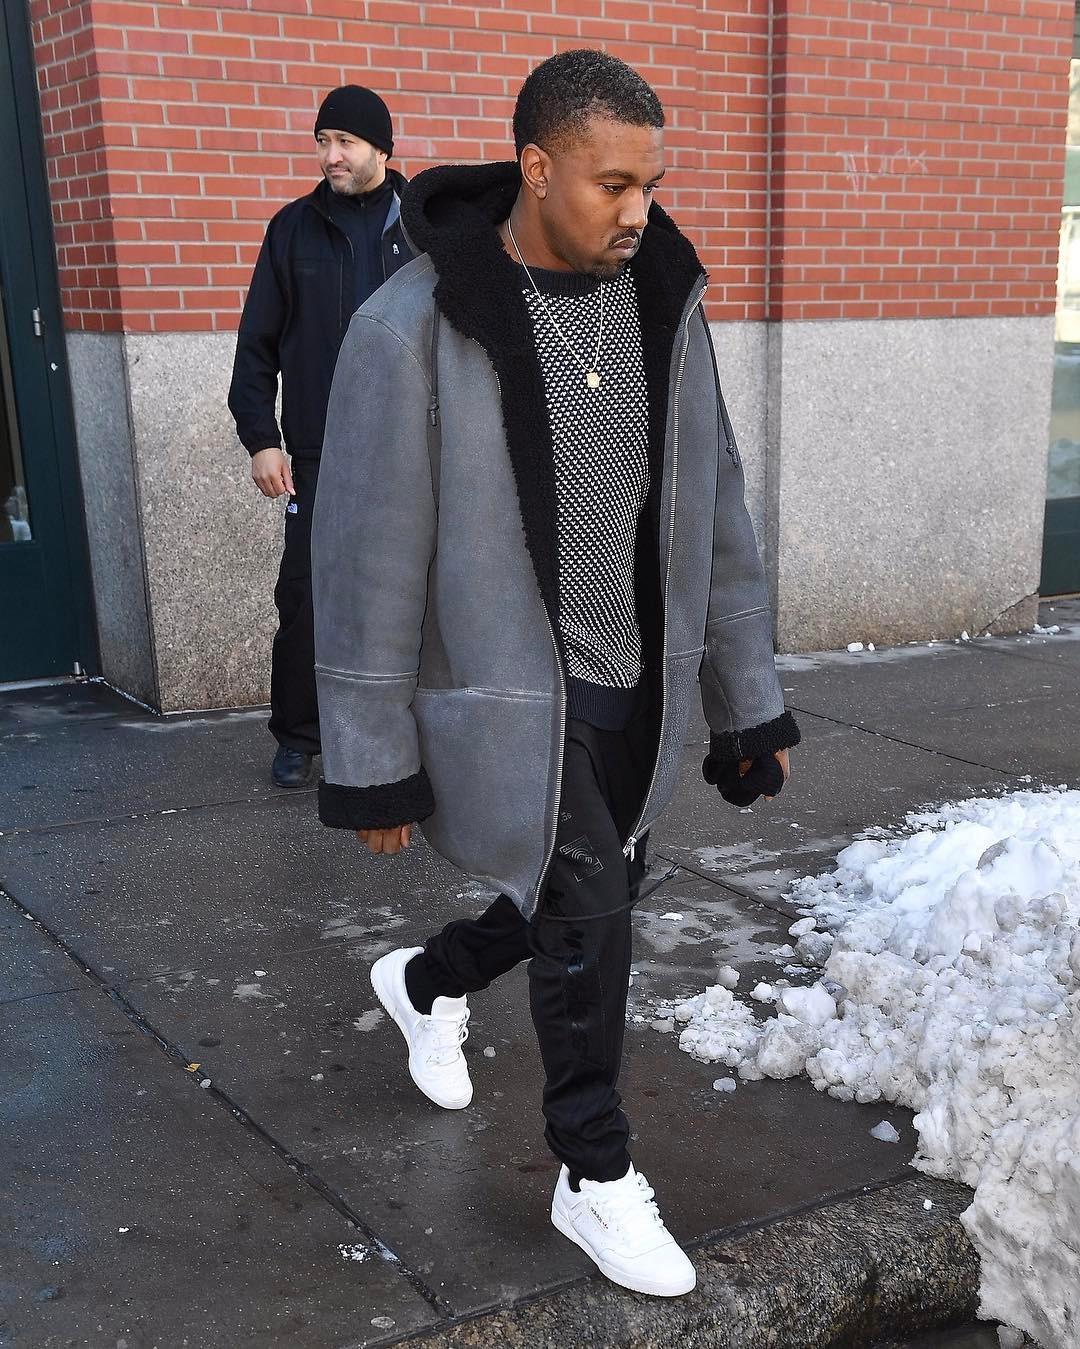 SPOTTED: Kanye West In Yeezy Season Coat And Yeezy Season Calabasas Sneakers